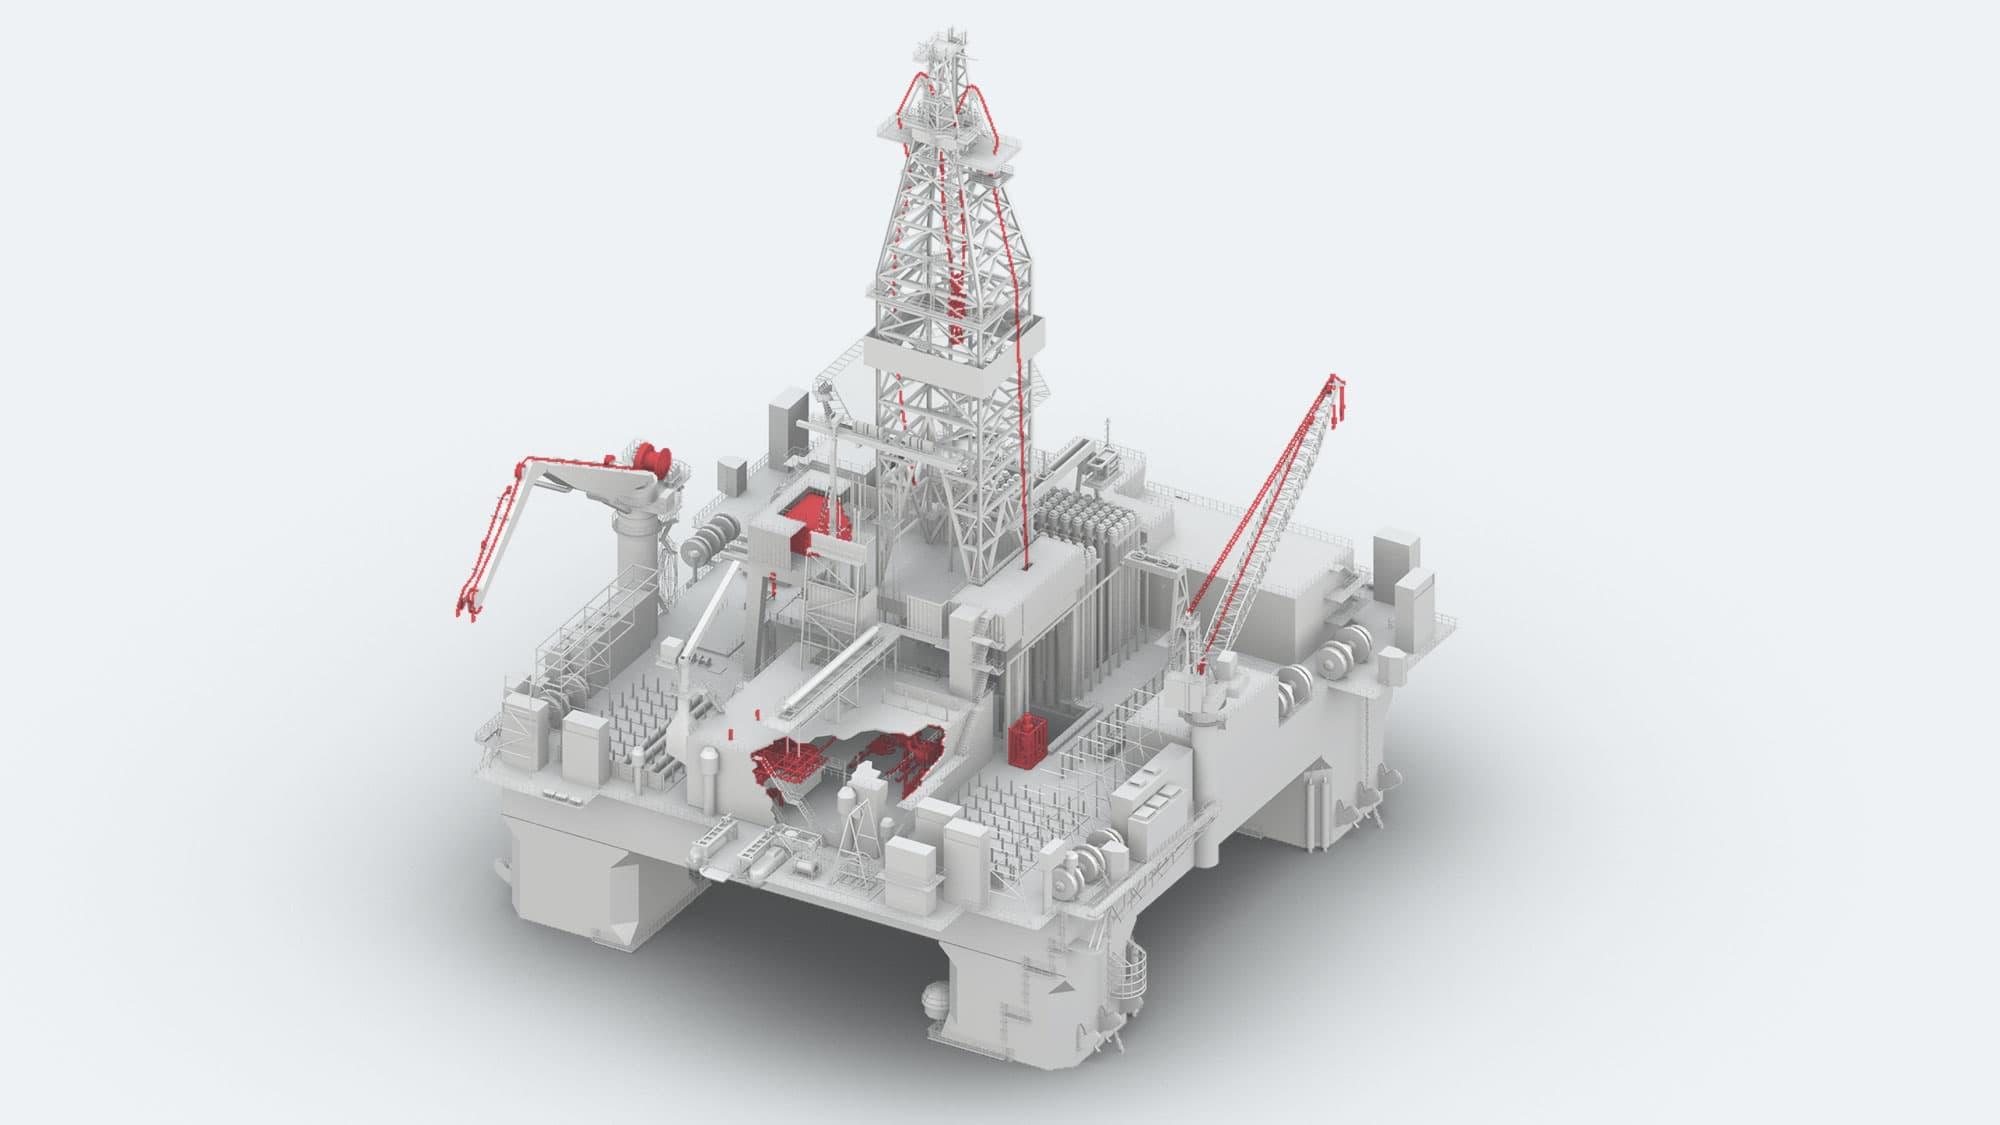 Semi-Submersible Rig